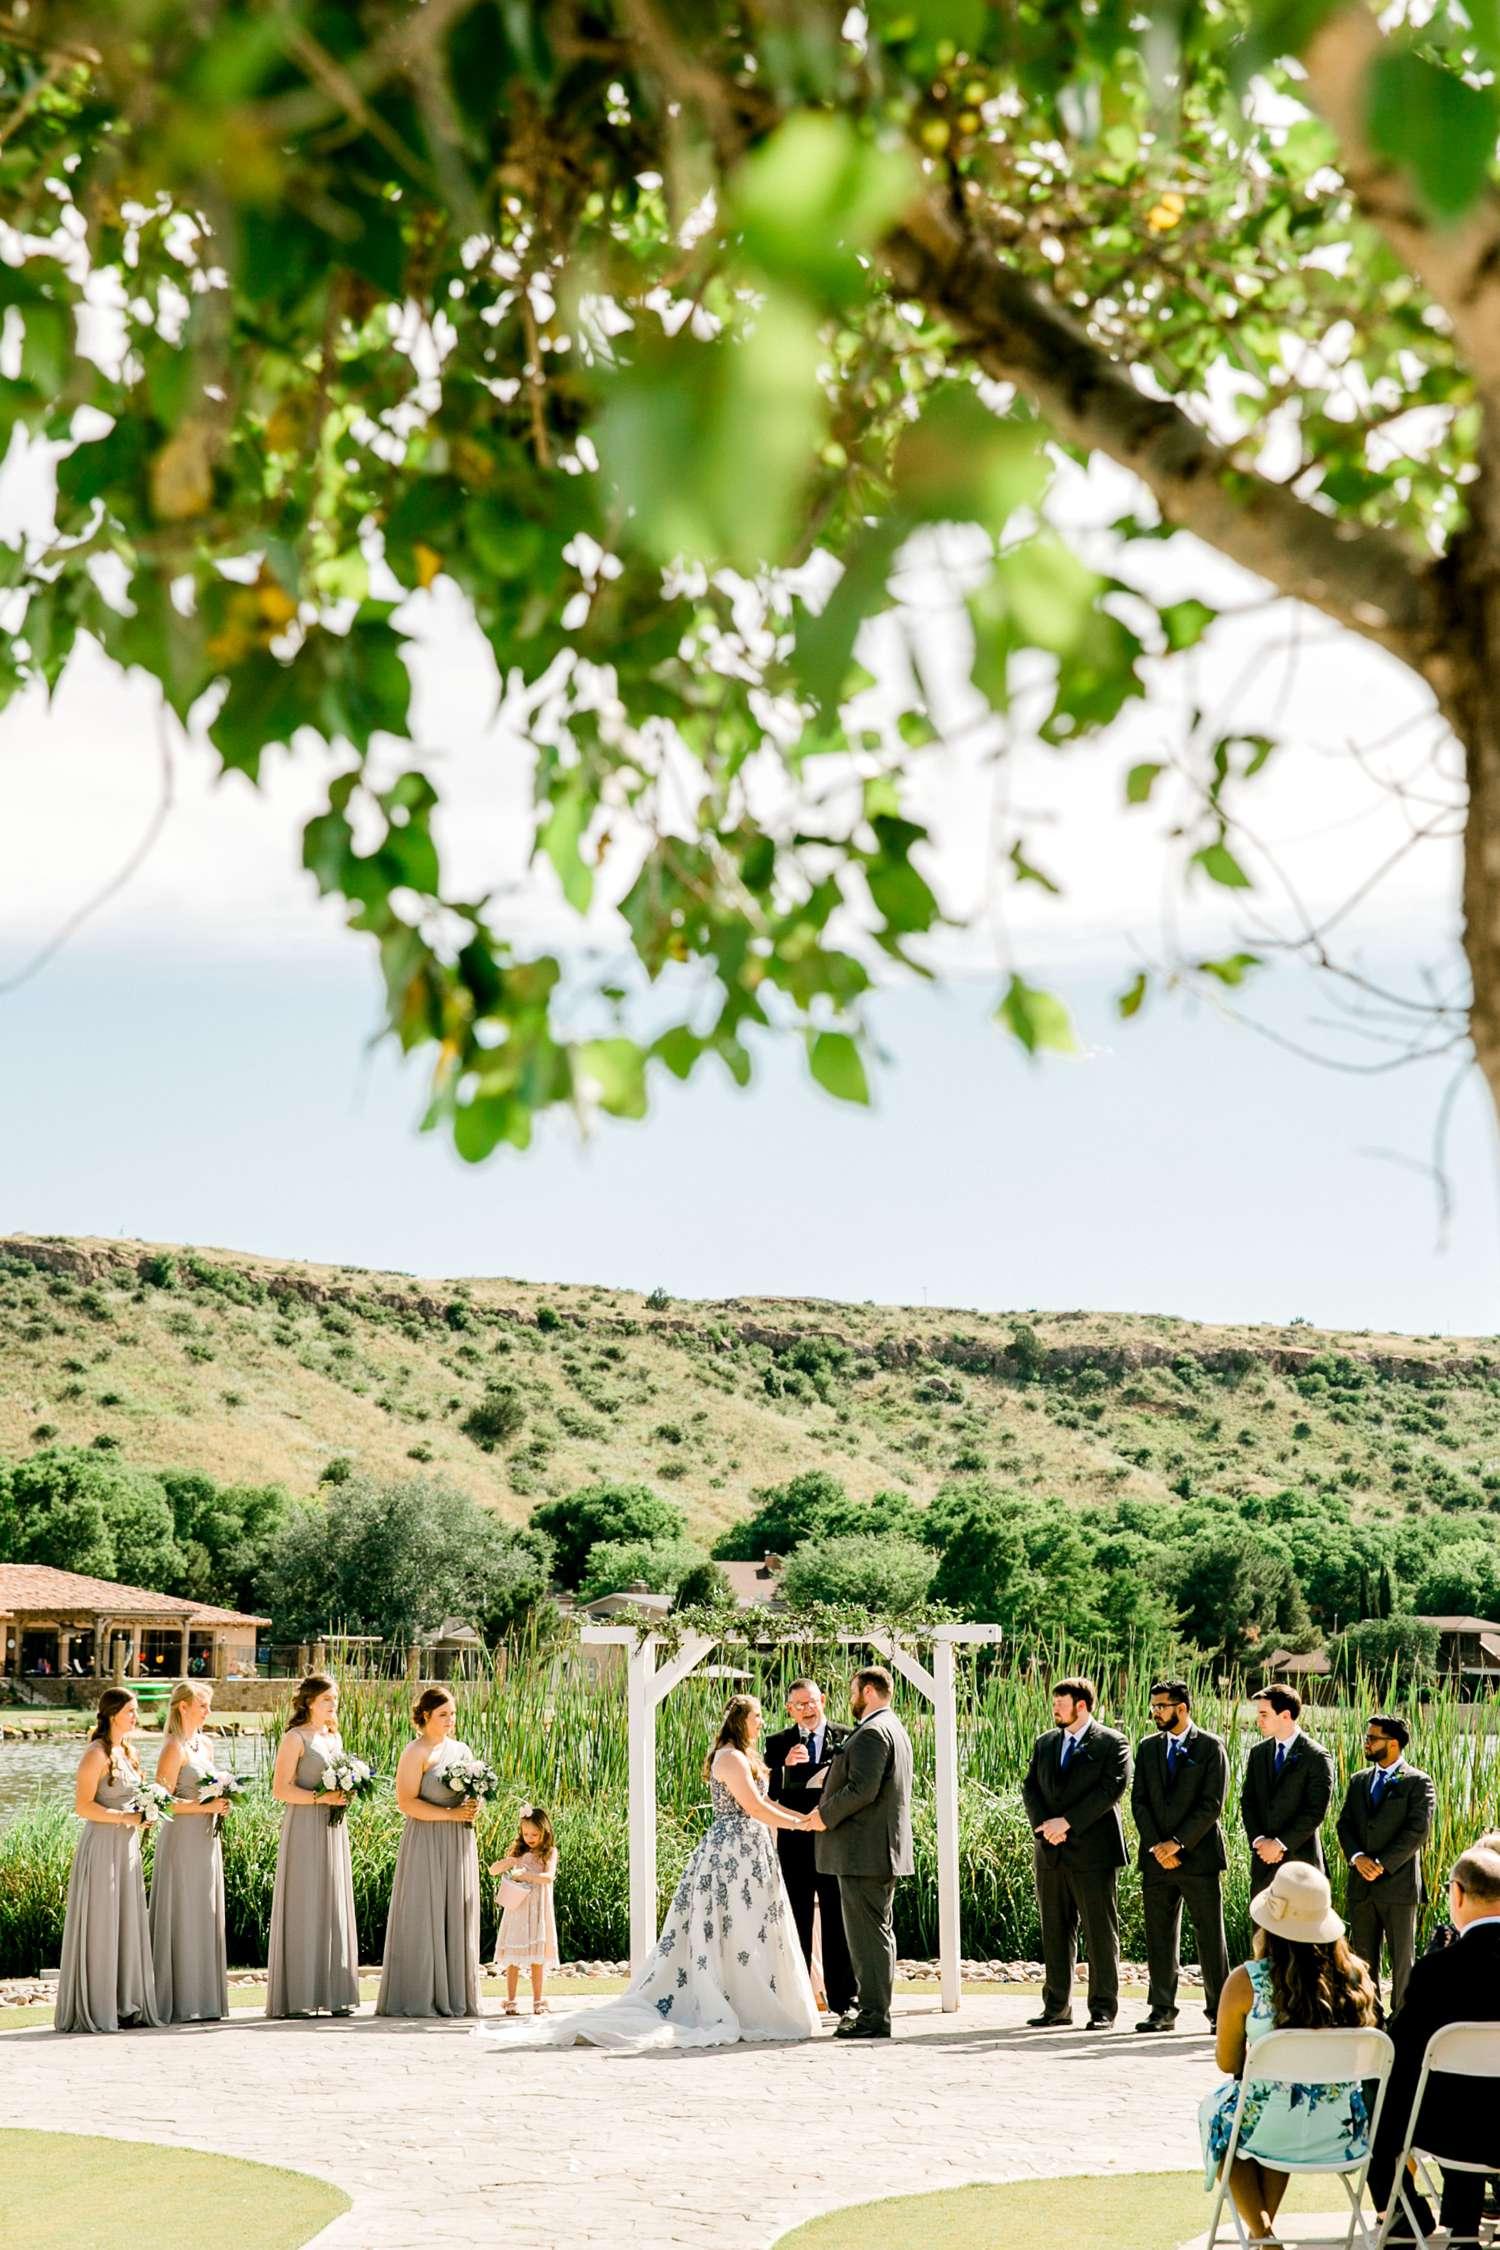 TY+NATHAN+HALLIER+ALLEEJ+WEDDING+PHOTOGRAPHER+RANSOM+CANYON_0085.jpg